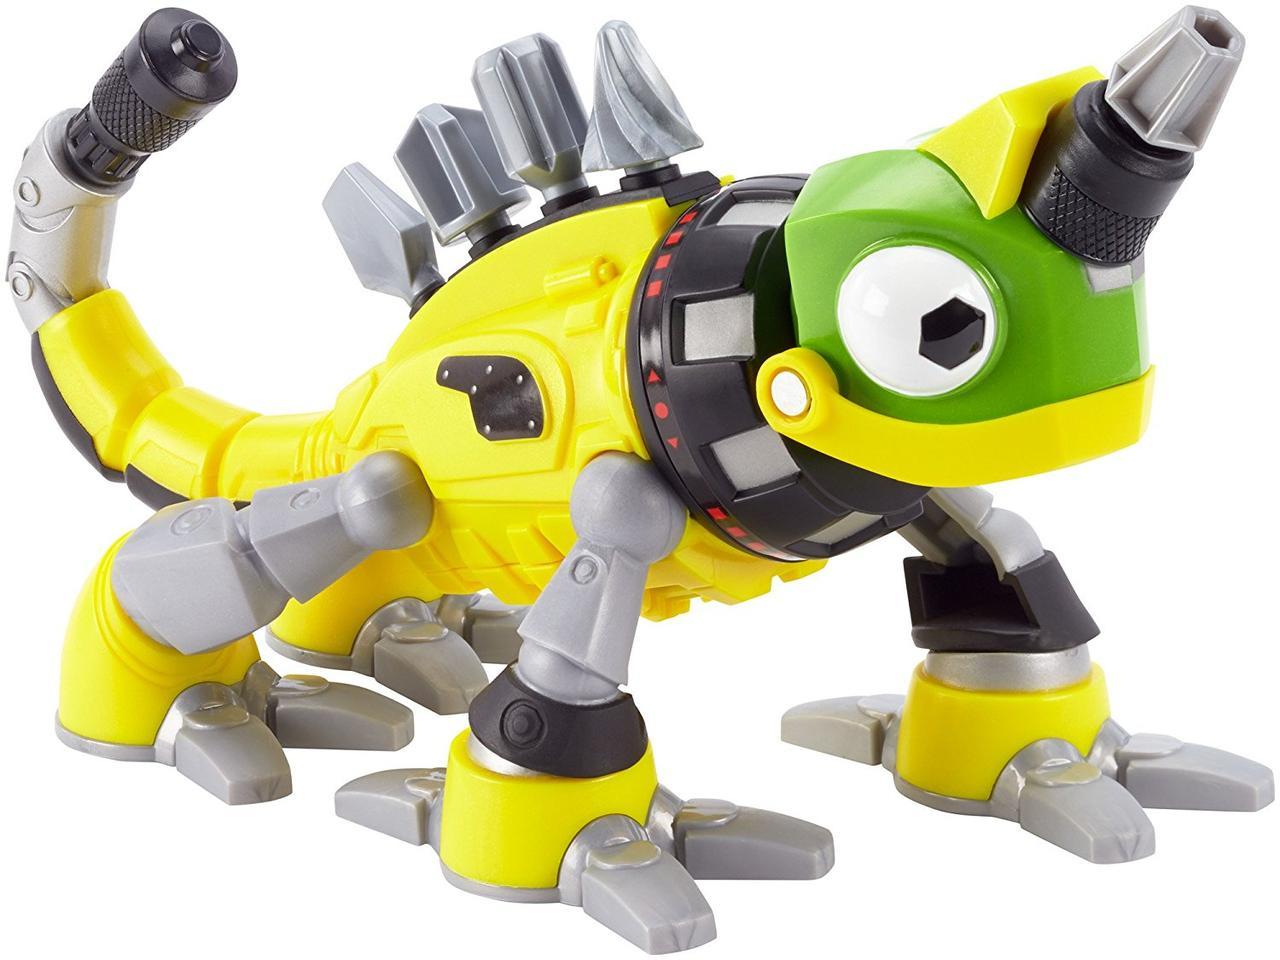 Mattel Динозавр хамелион Динотракс Реввит со звуковыми эффектами Dinotrux Friend Revvit Vehicle